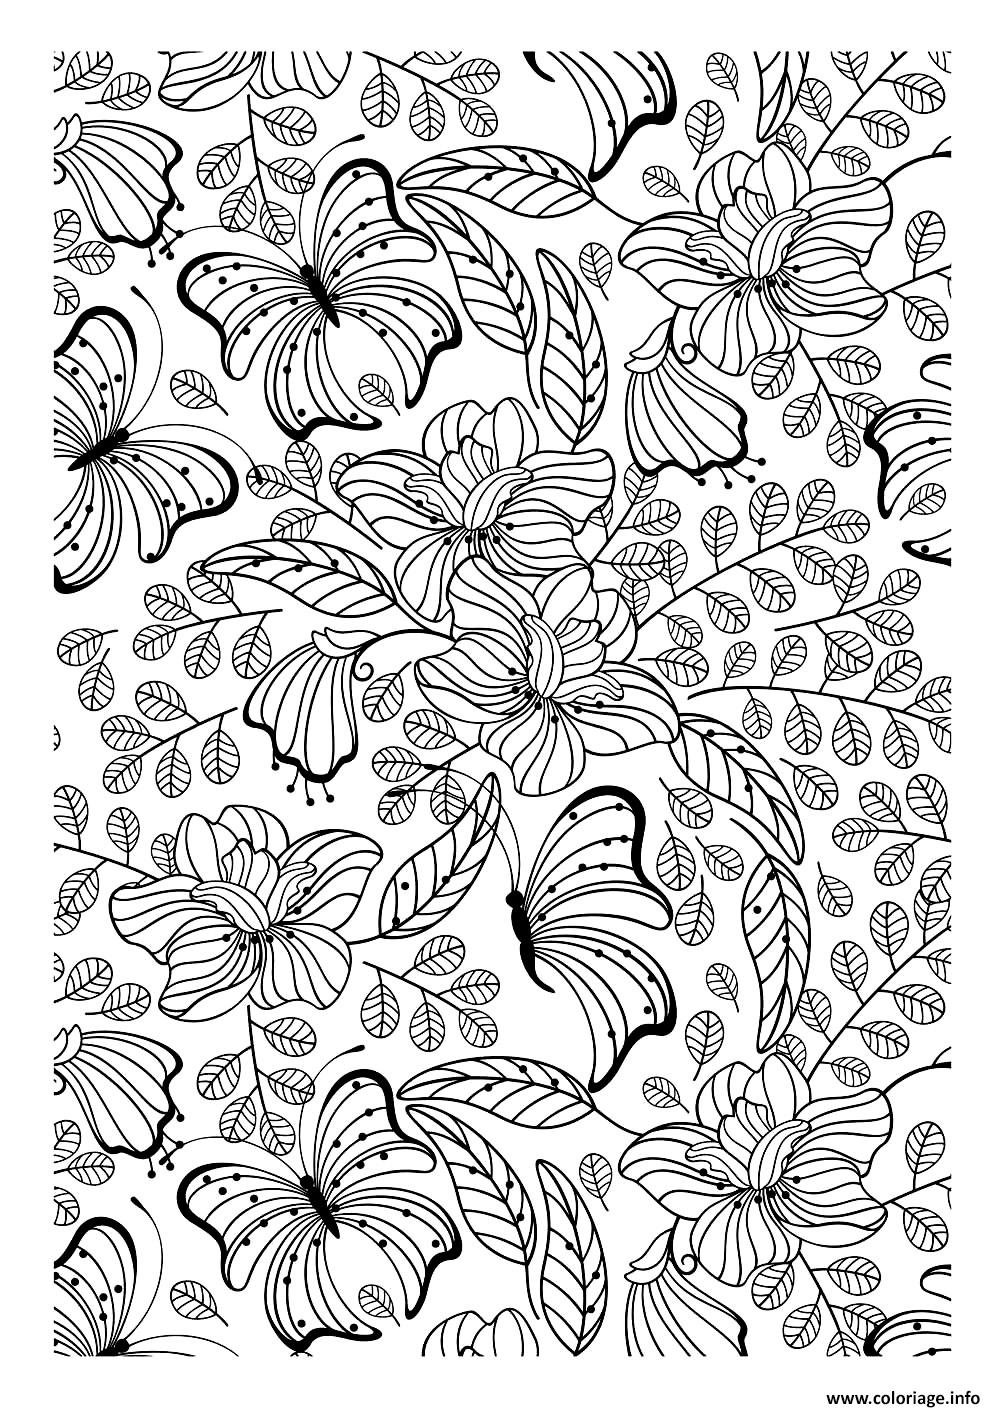 coloriage adulte papillons dessin